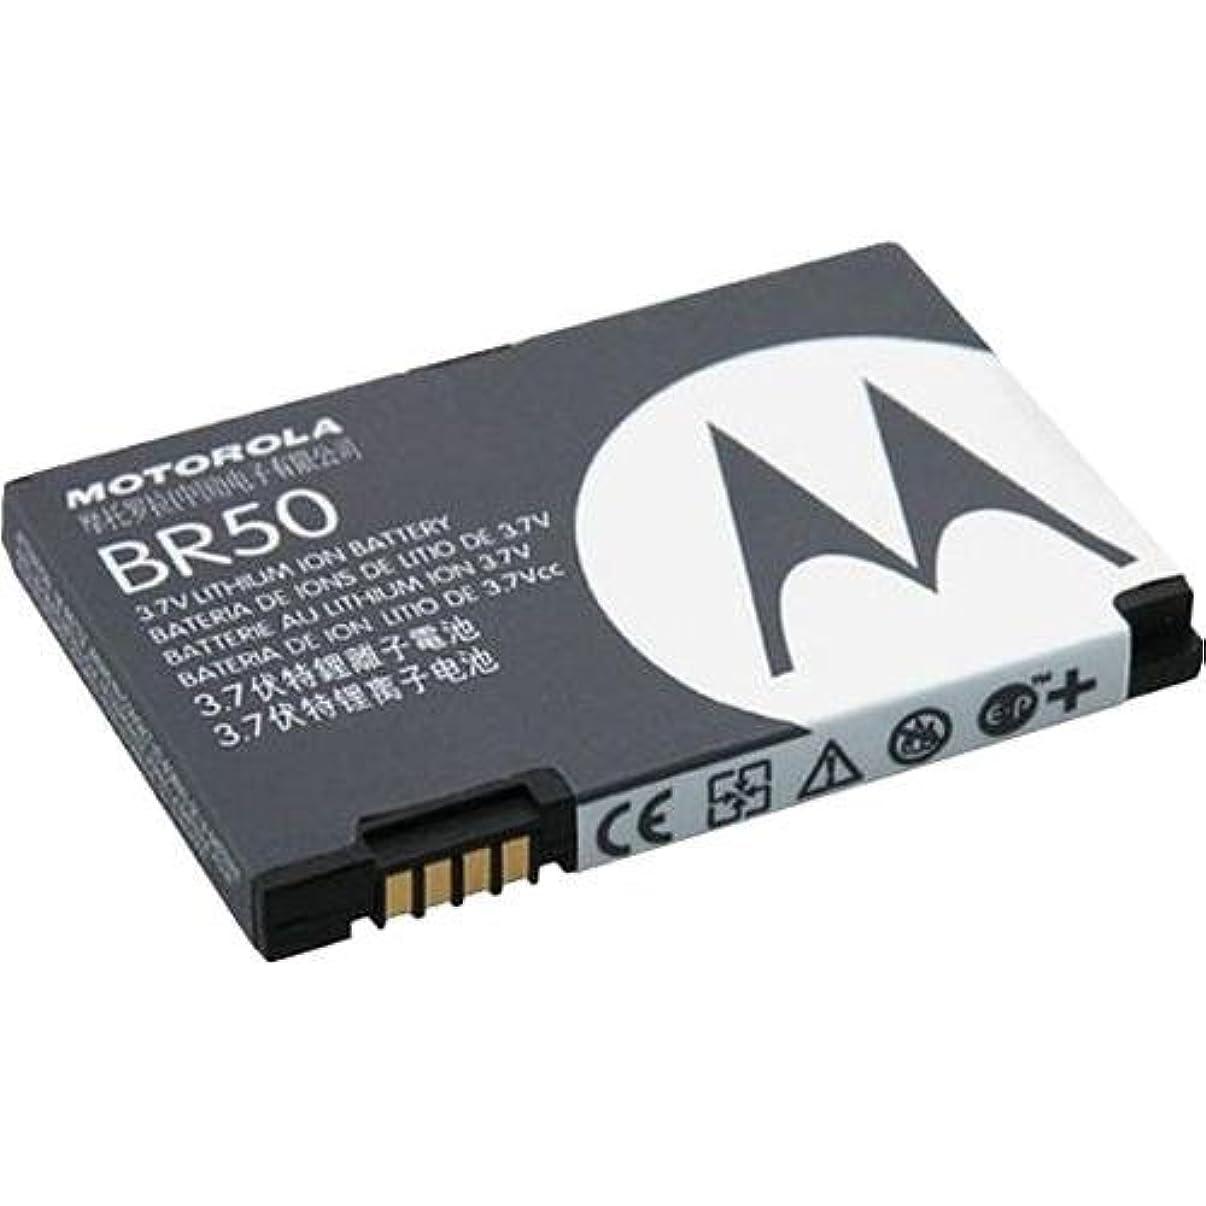 Br50 - Motorola Razr V3 / V3c / V3i OEM Li-ion Battery - Black Battery